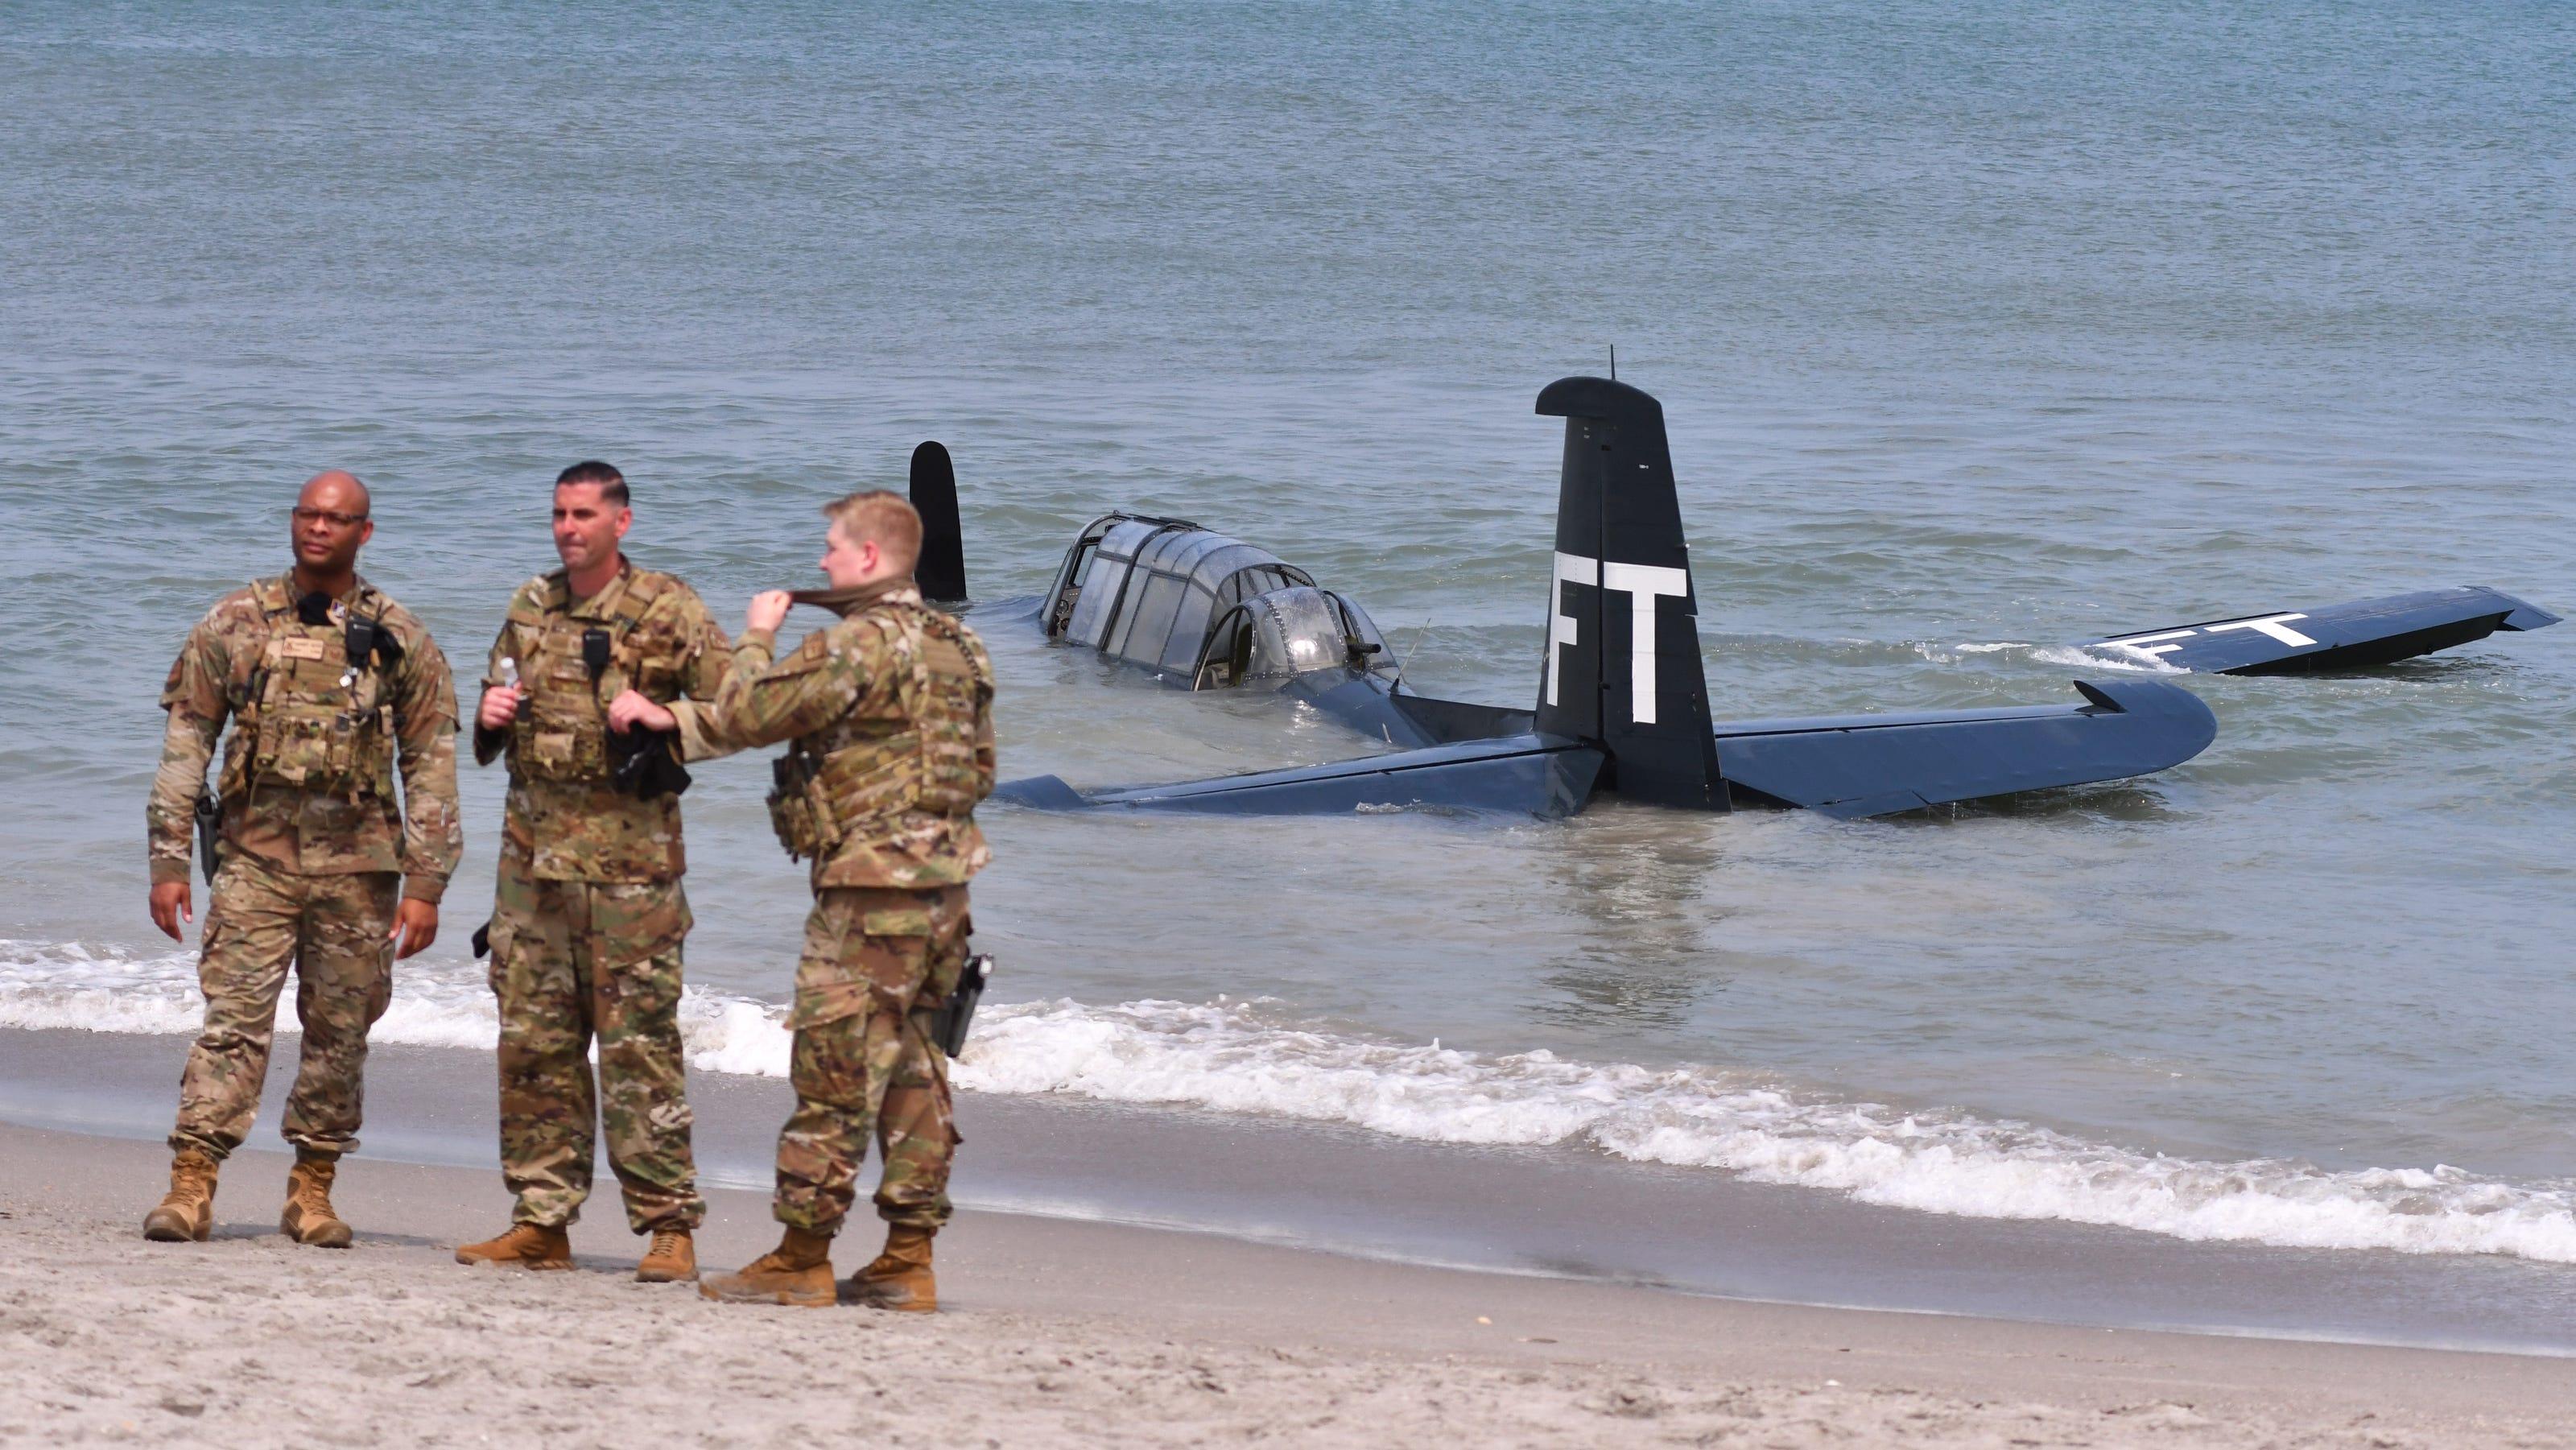 World War II-era plane makes emergency landing in surf off of Florida beach